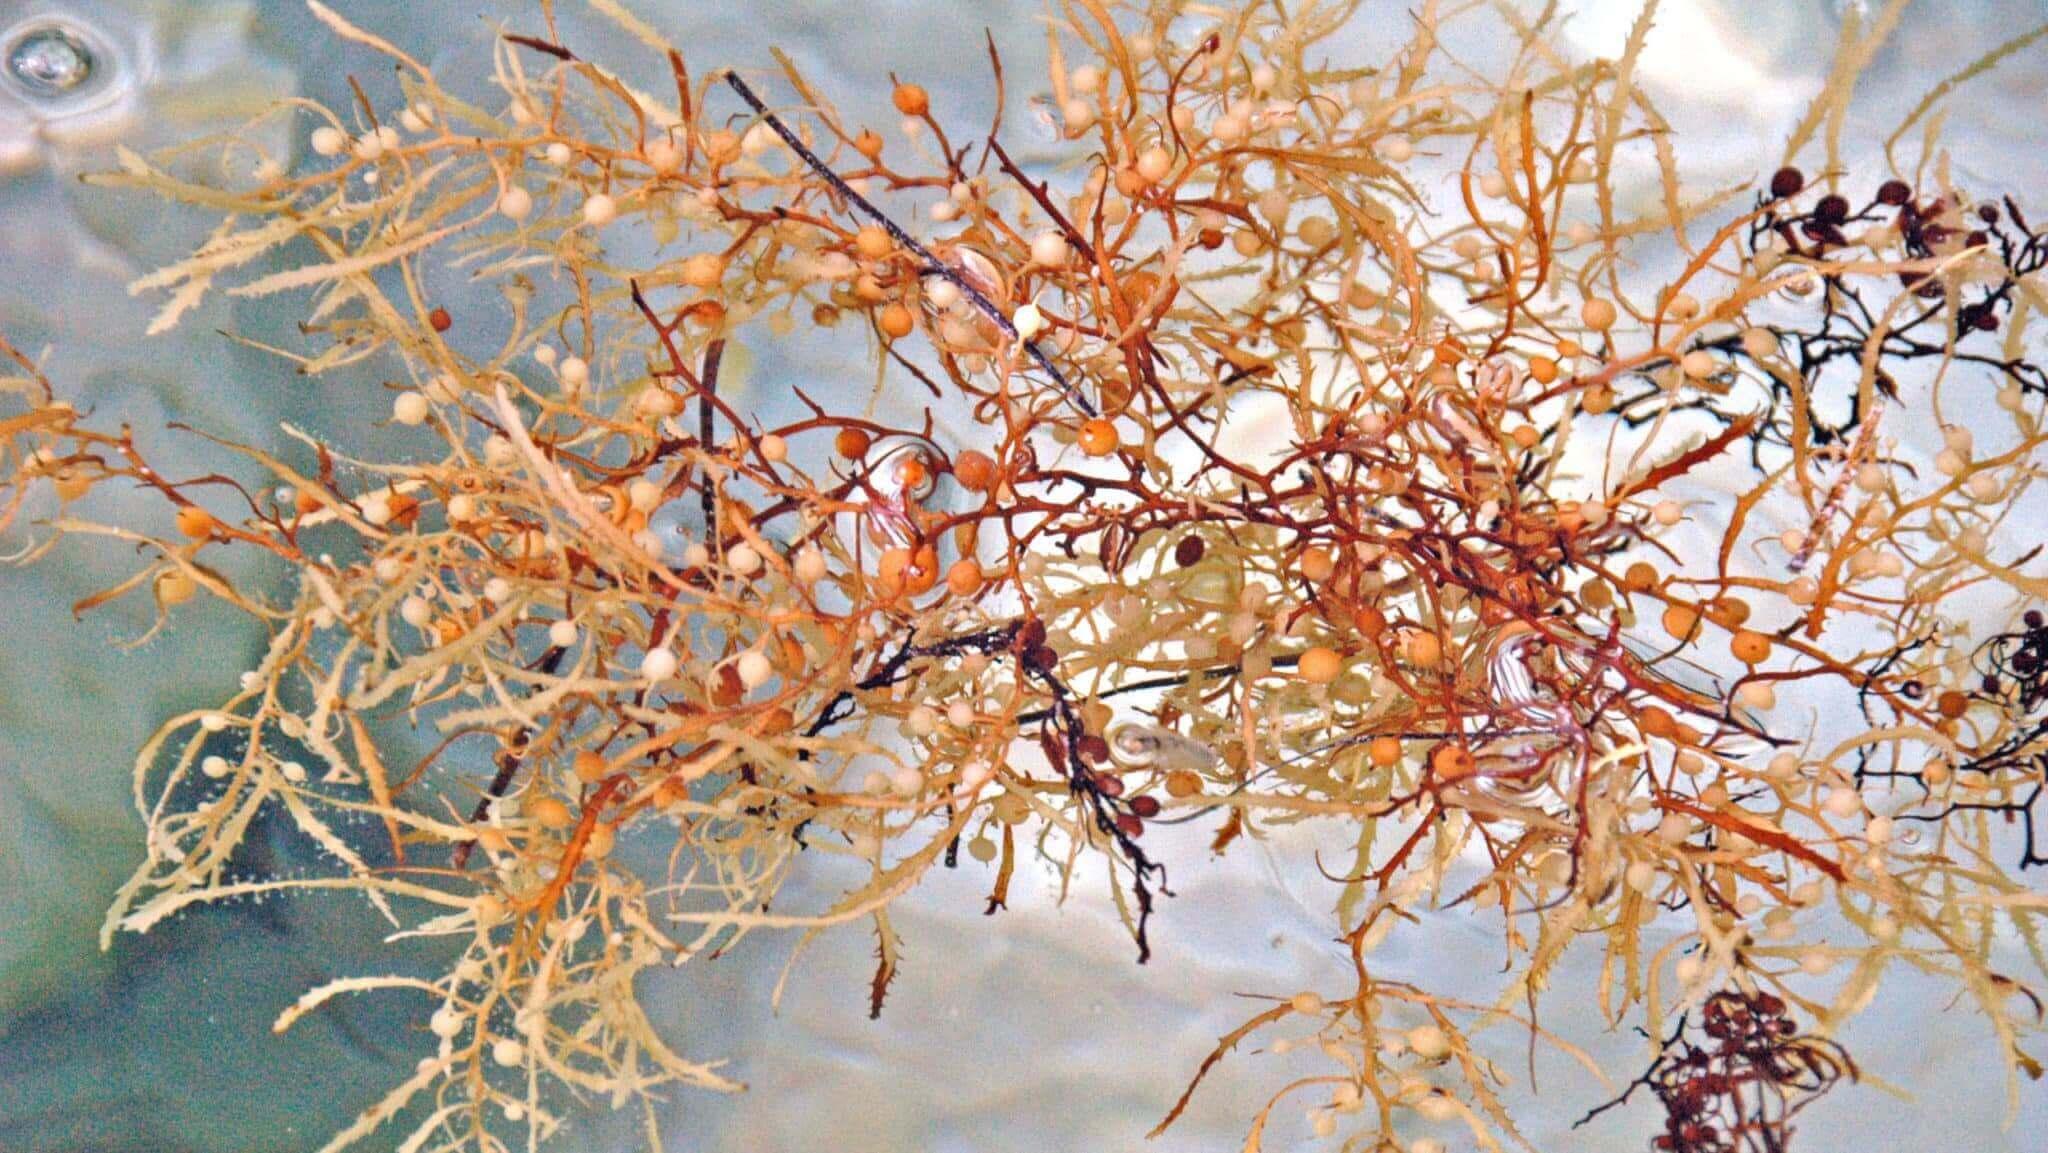 The Sargassum comes in abundance across the ocean